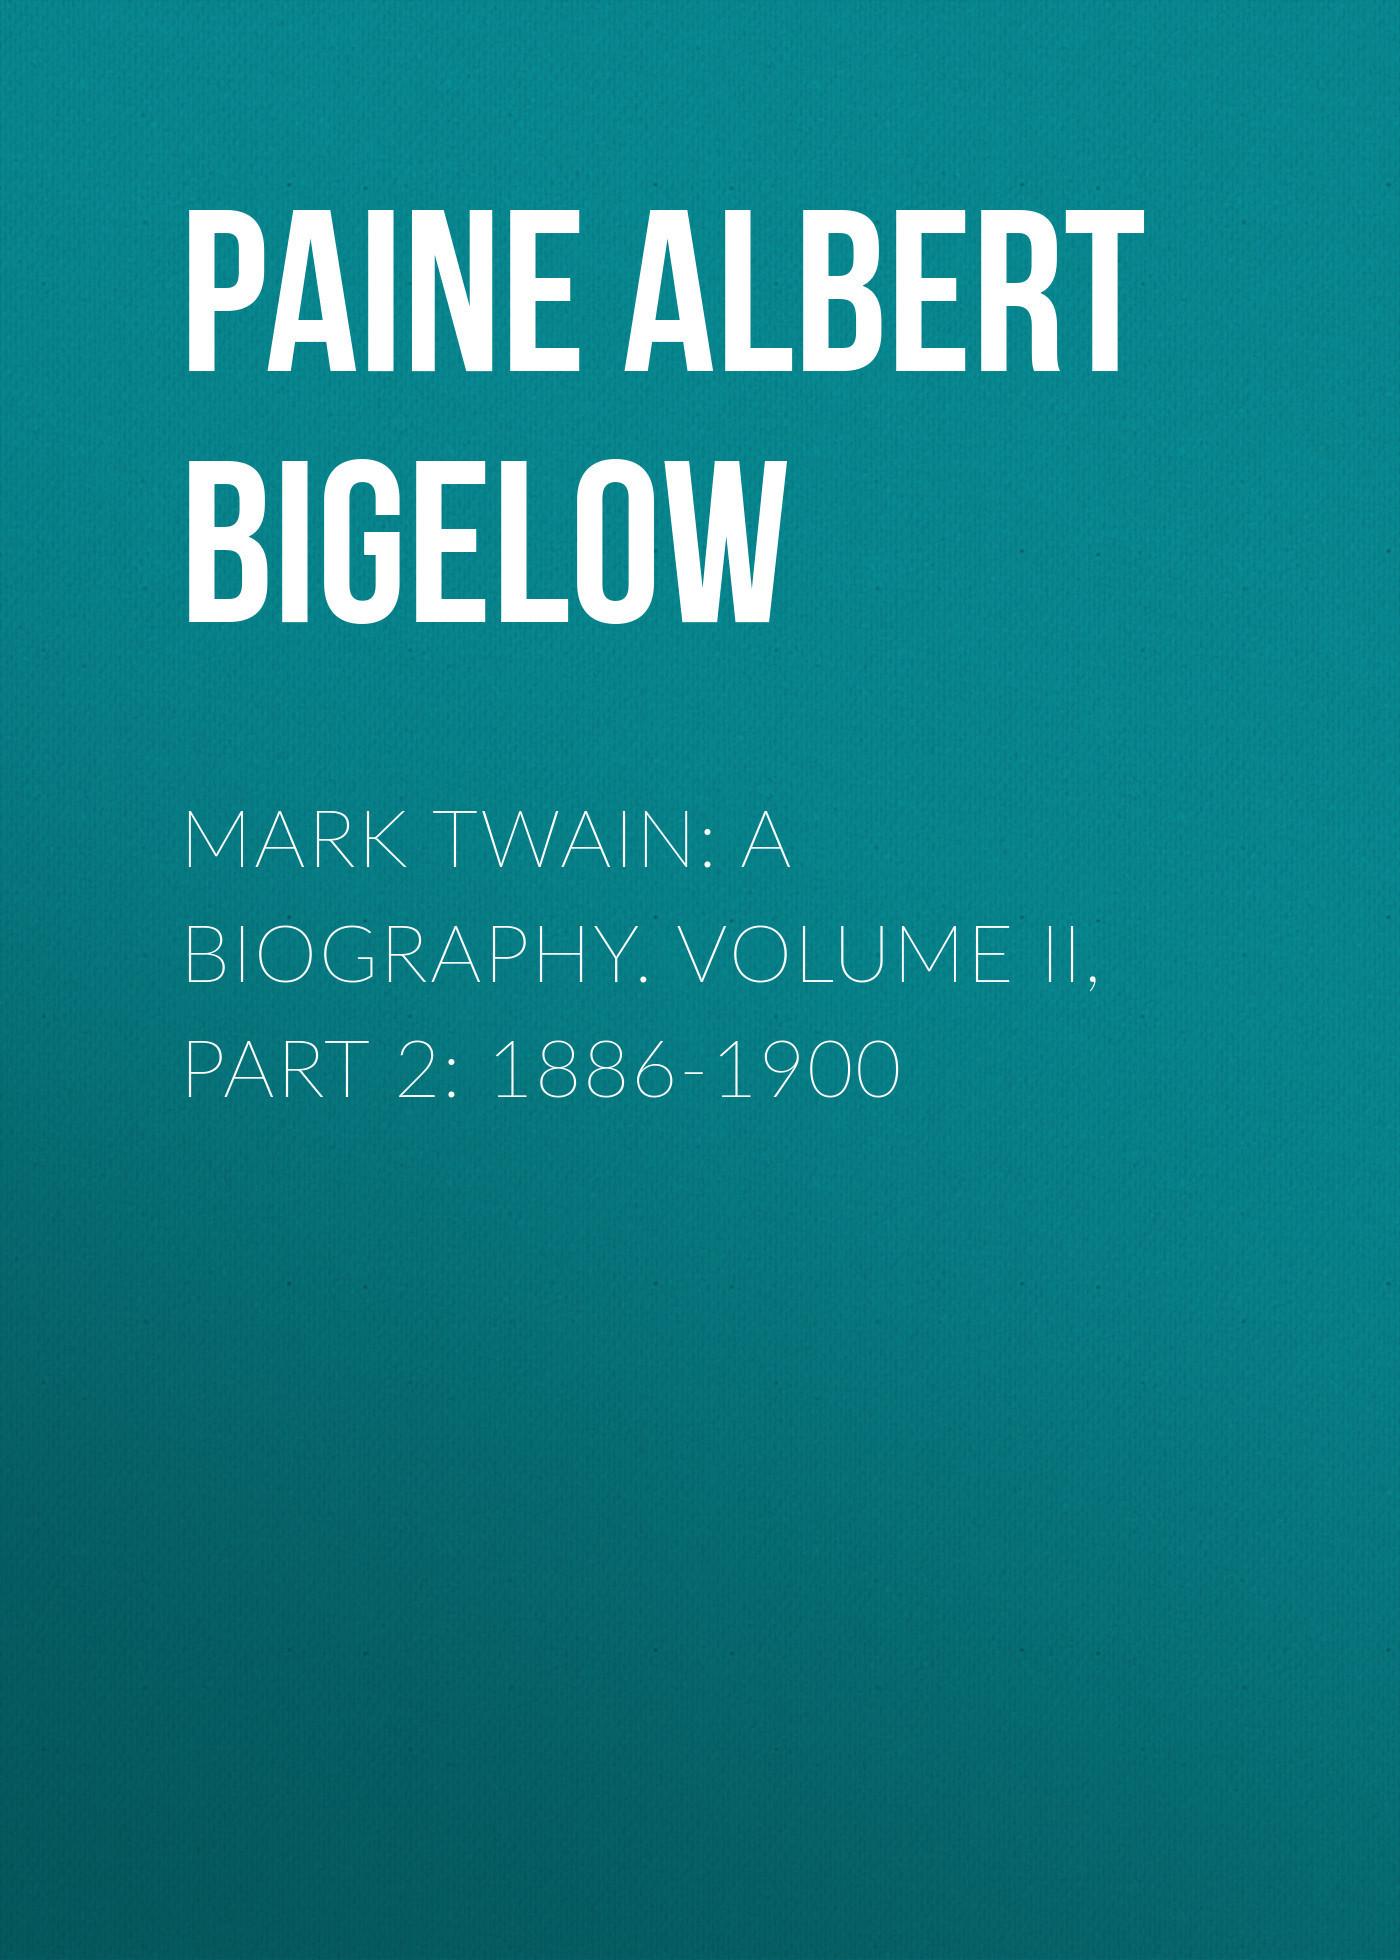 Paine Albert Bigelow Mark Twain: A Biography. Volume II, Part 2: 1886-1900 flush a biography vintage lives